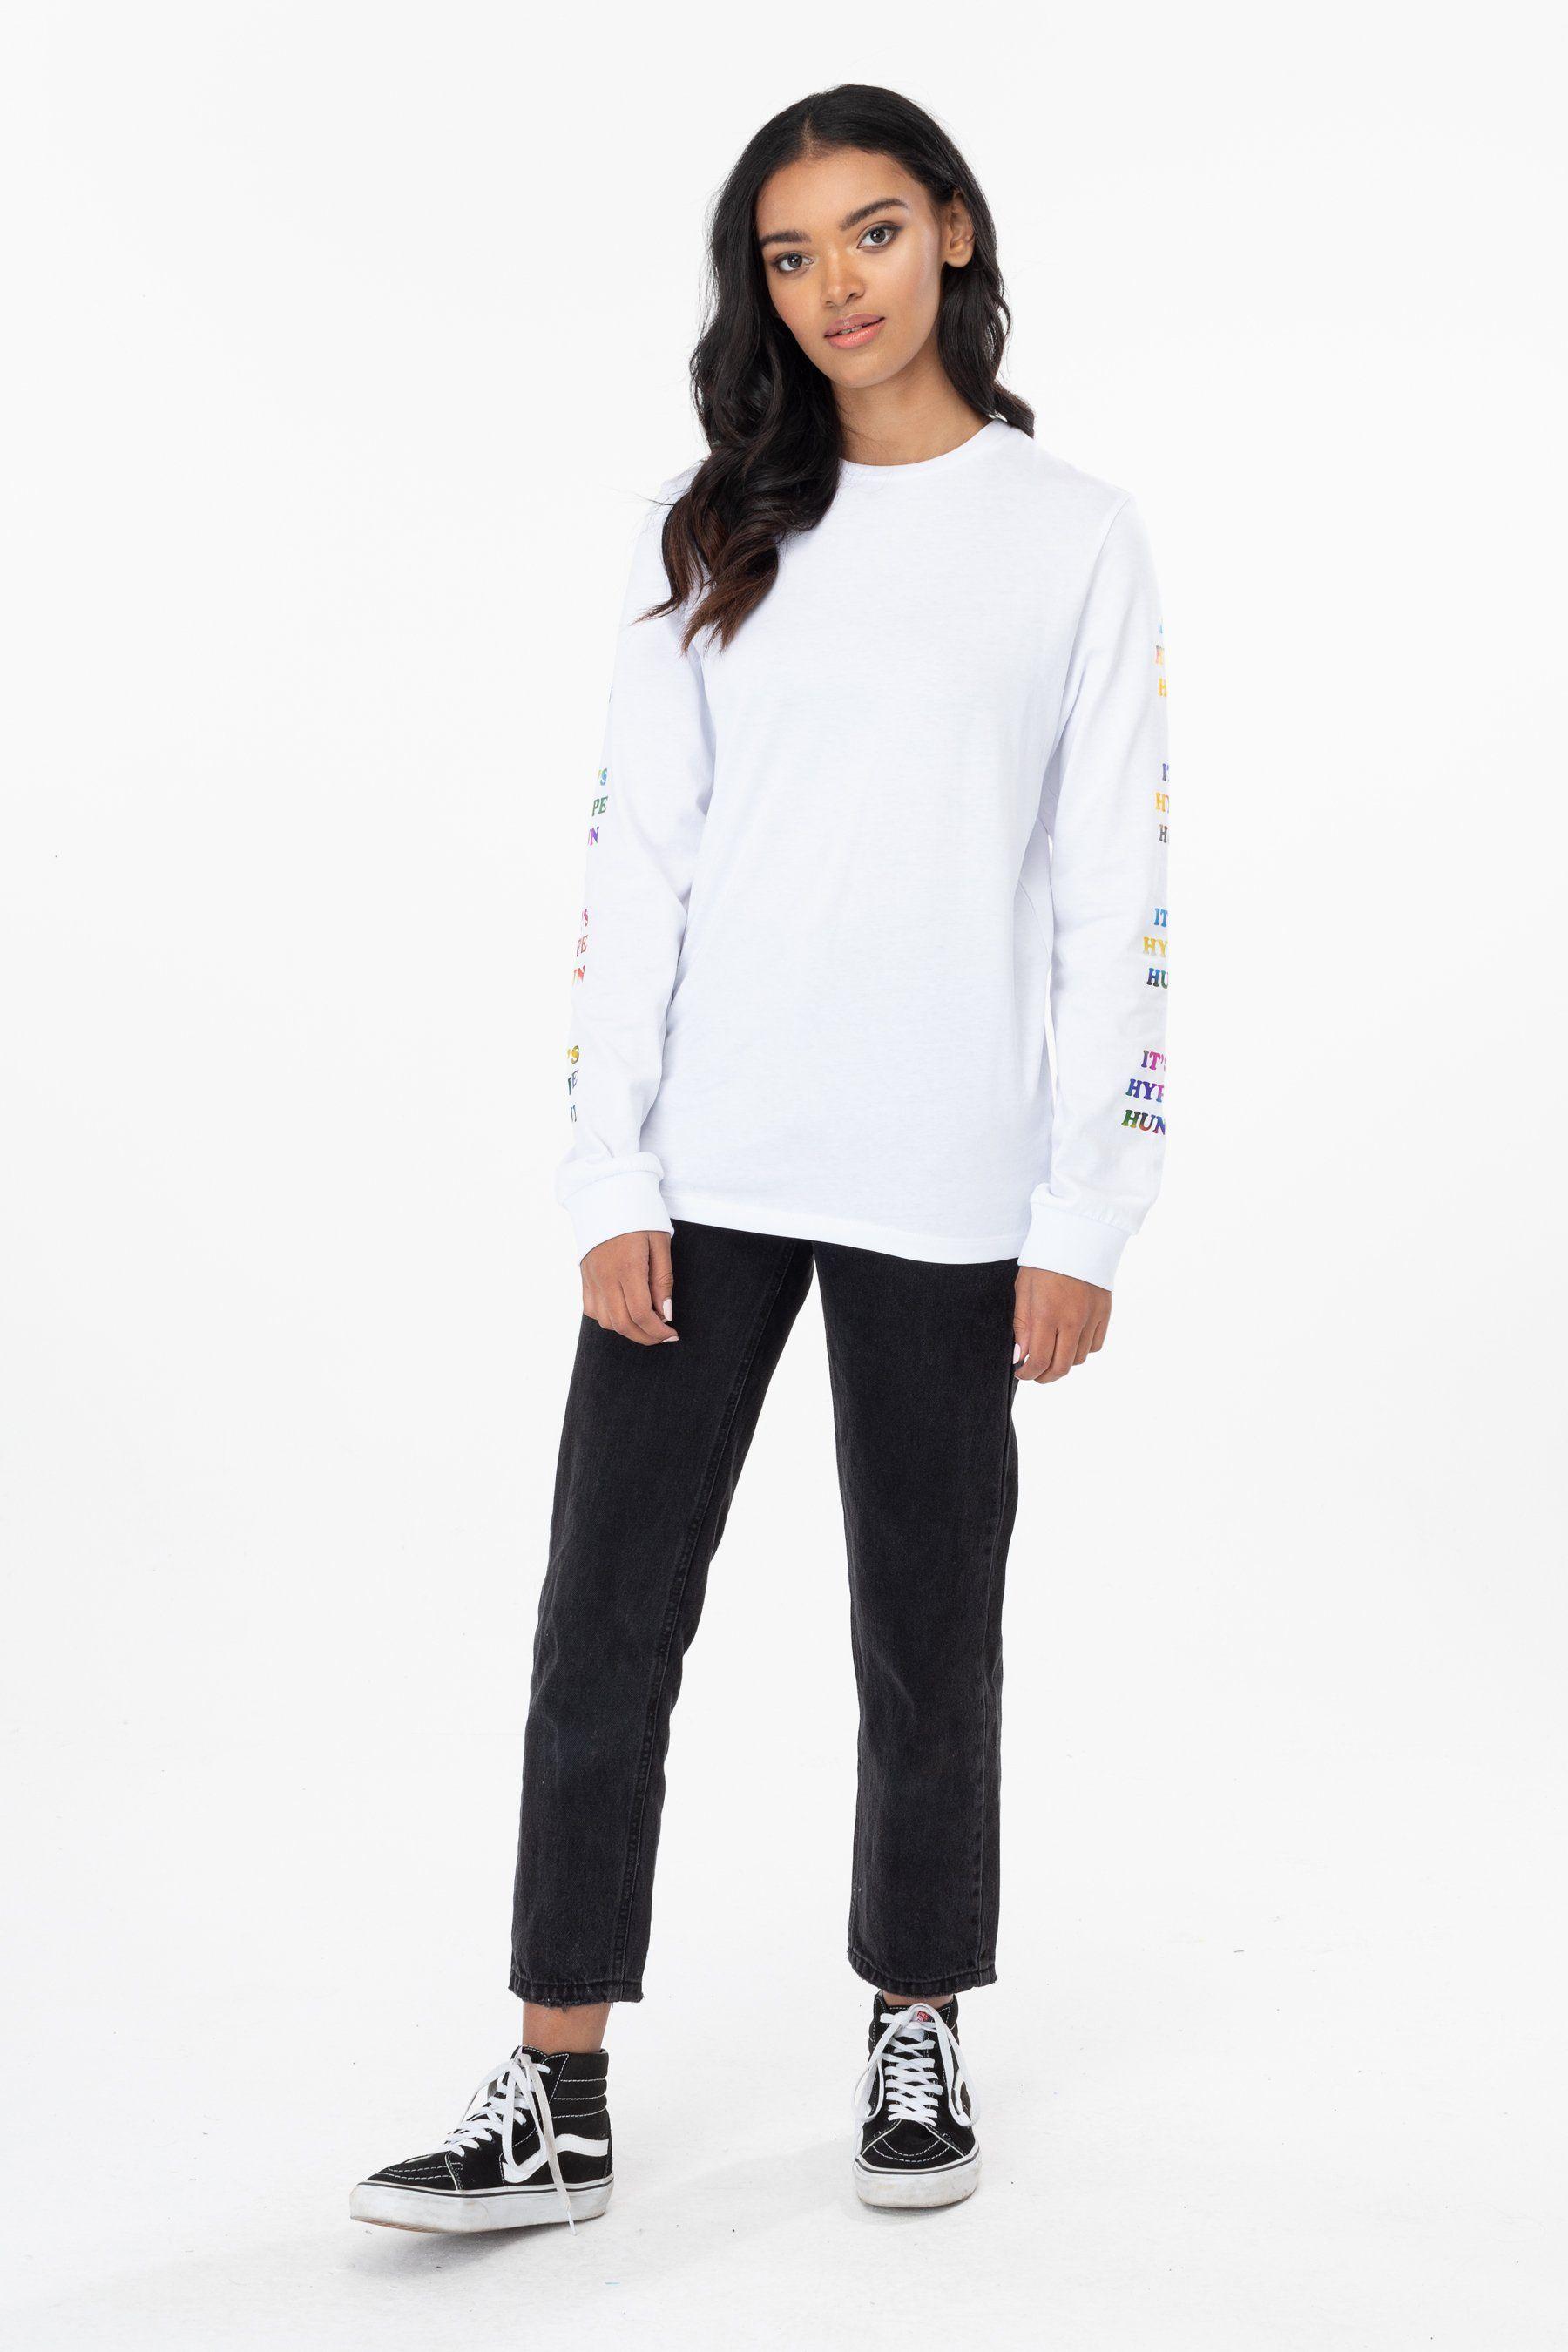 Hype White Hun Womens L/S T-Shirt